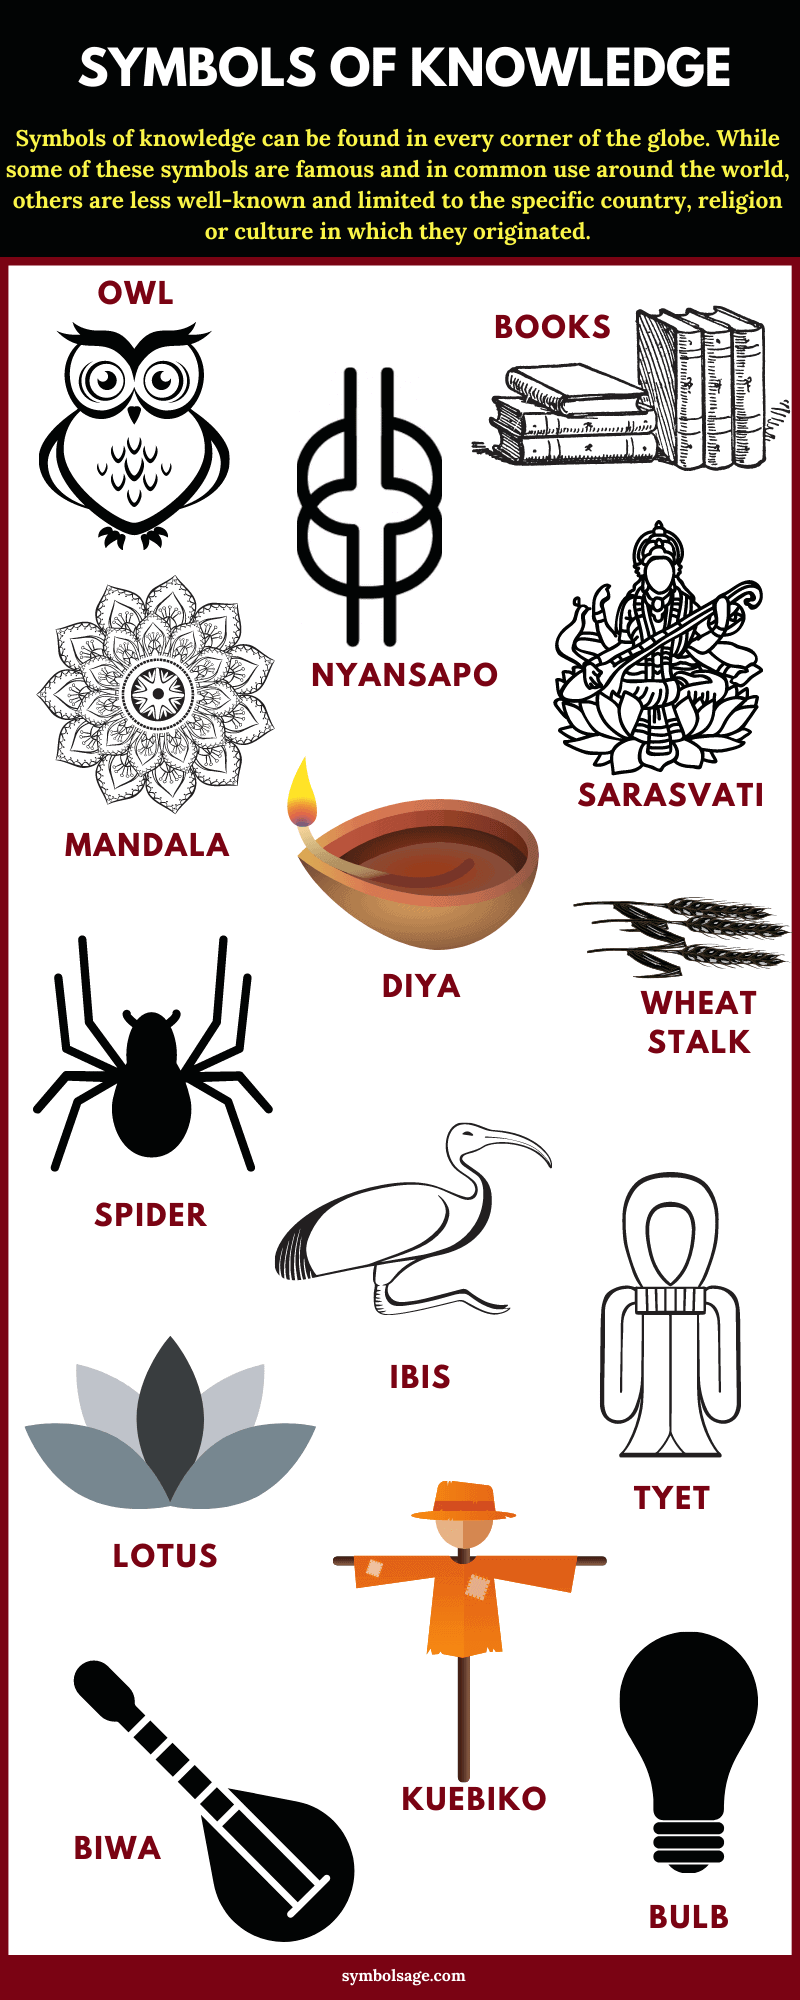 List of knowledge symbols